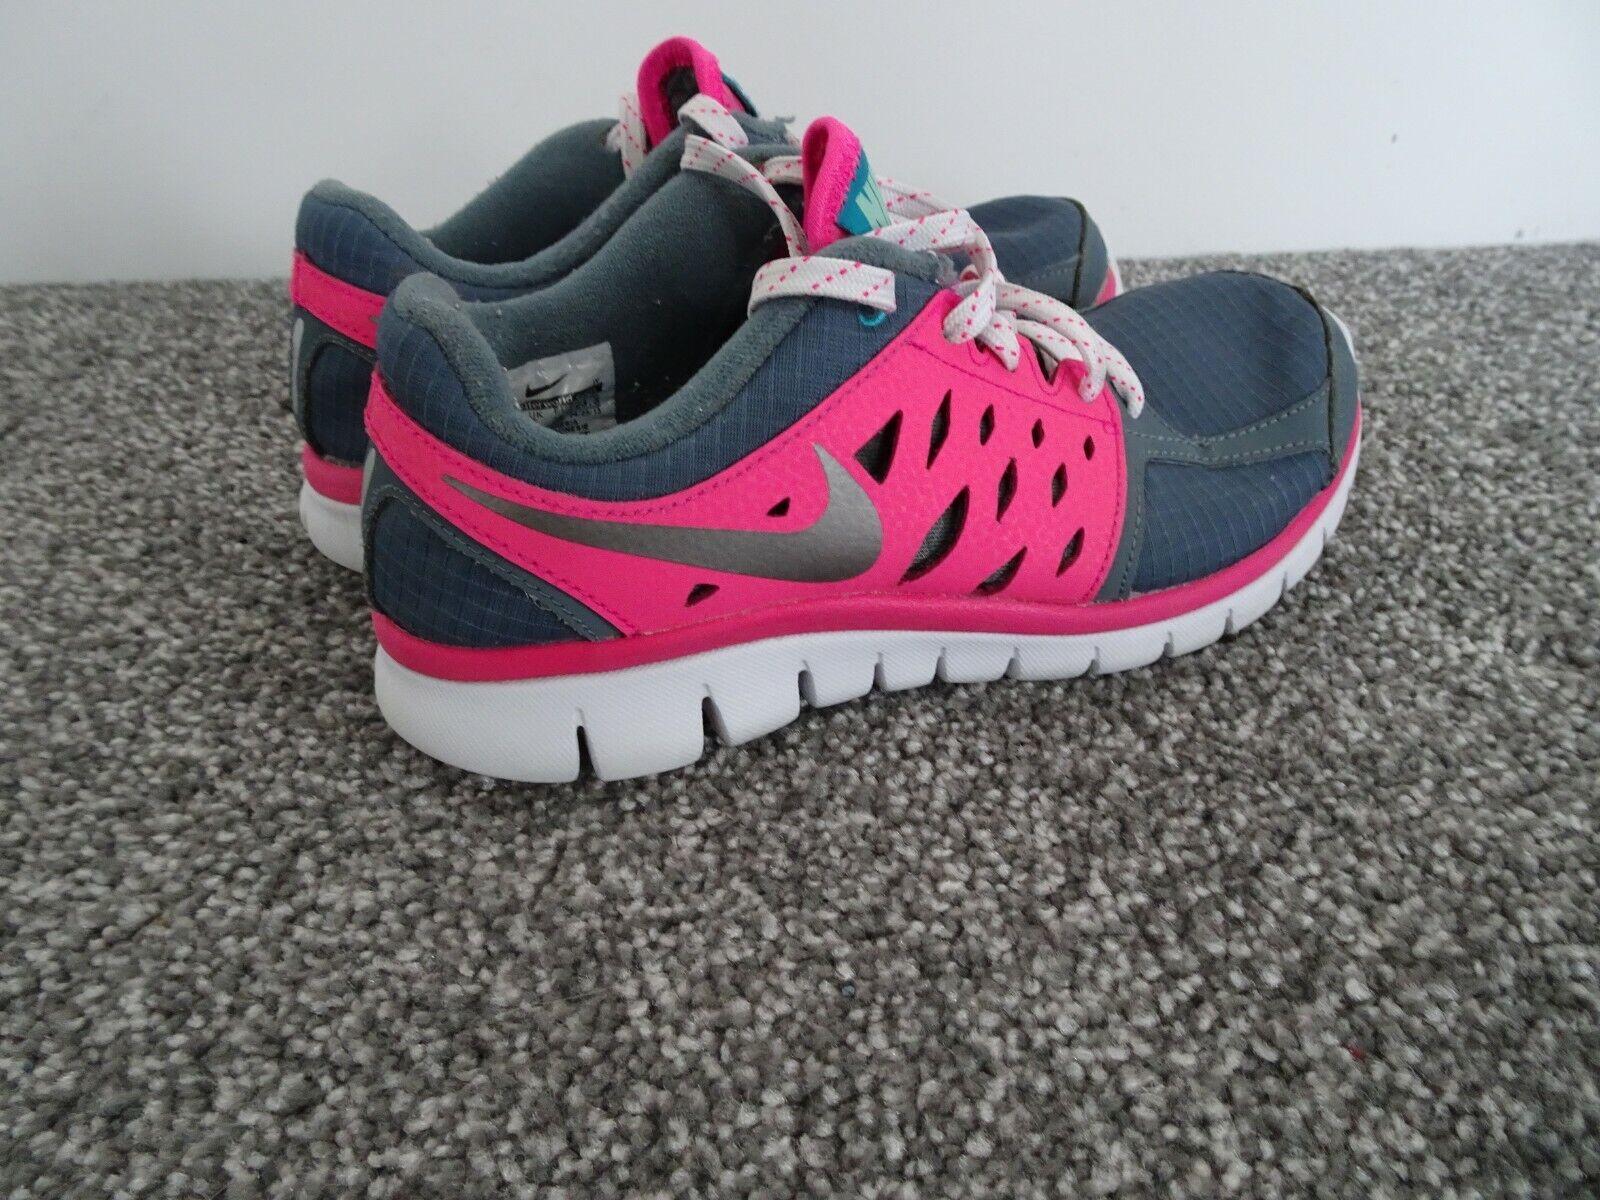 Nike Nike Nike flex 2013 correre donne correndo formatori   Consegna Immediata  821d01